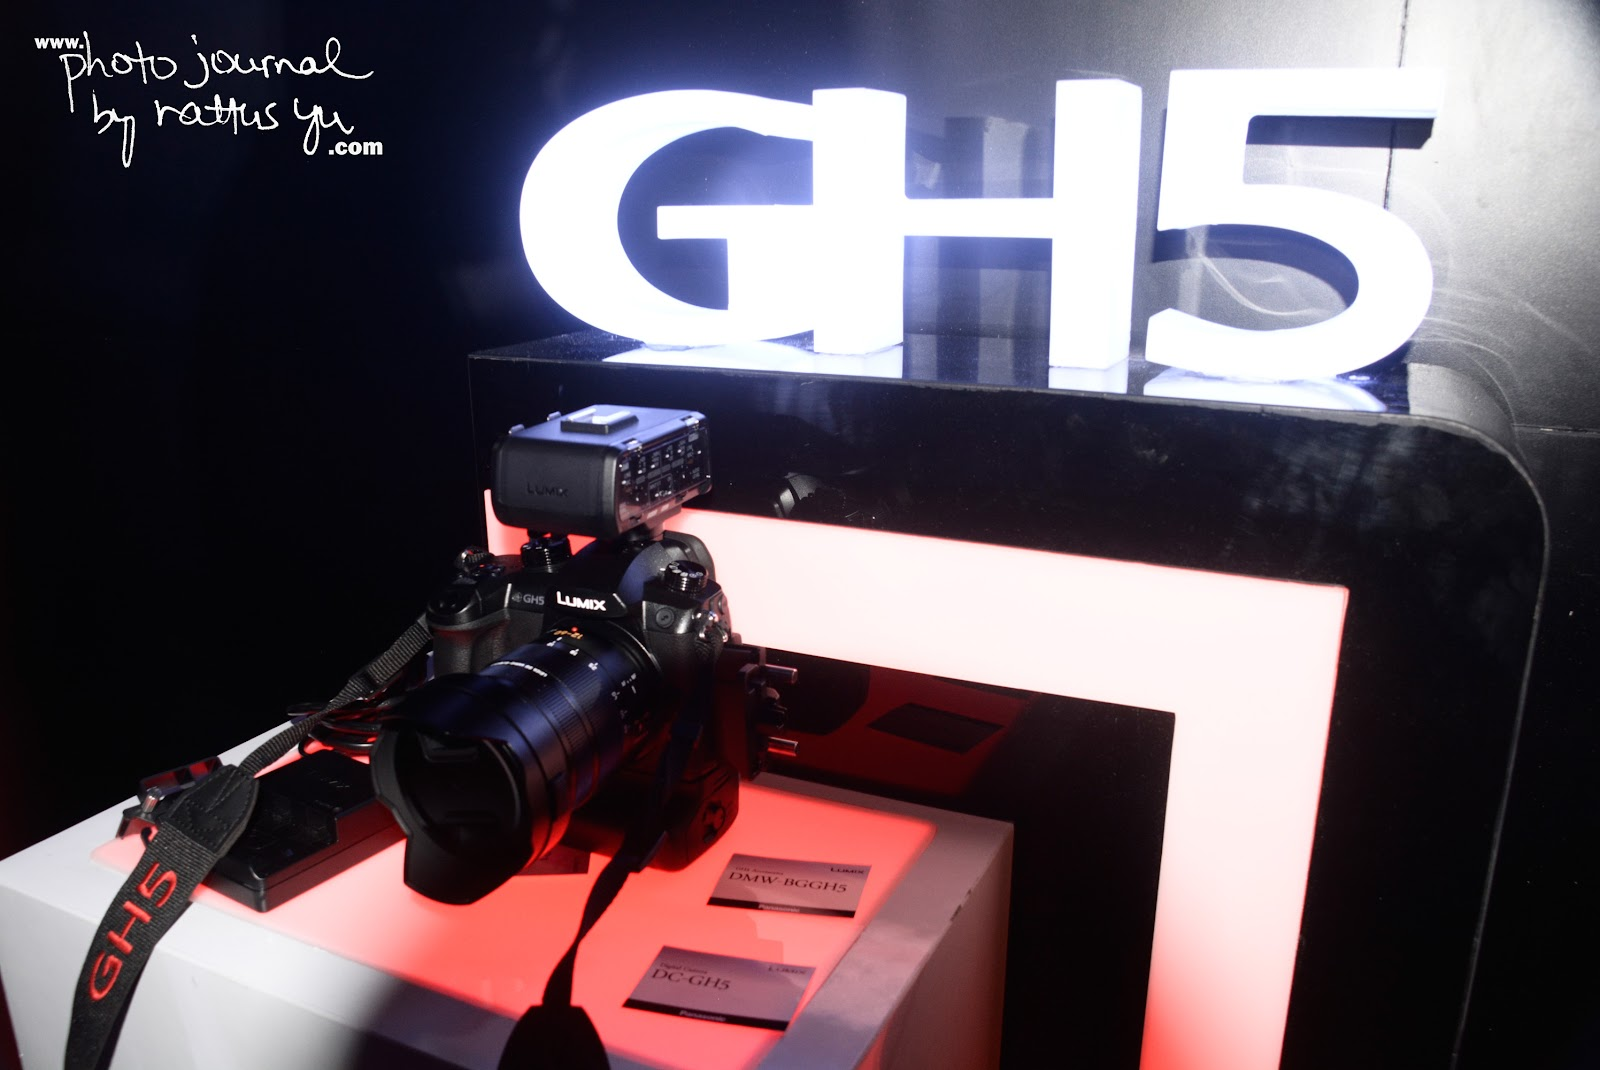 Panasonic Lumix GH5, New Micro 4/3 Camera 2017